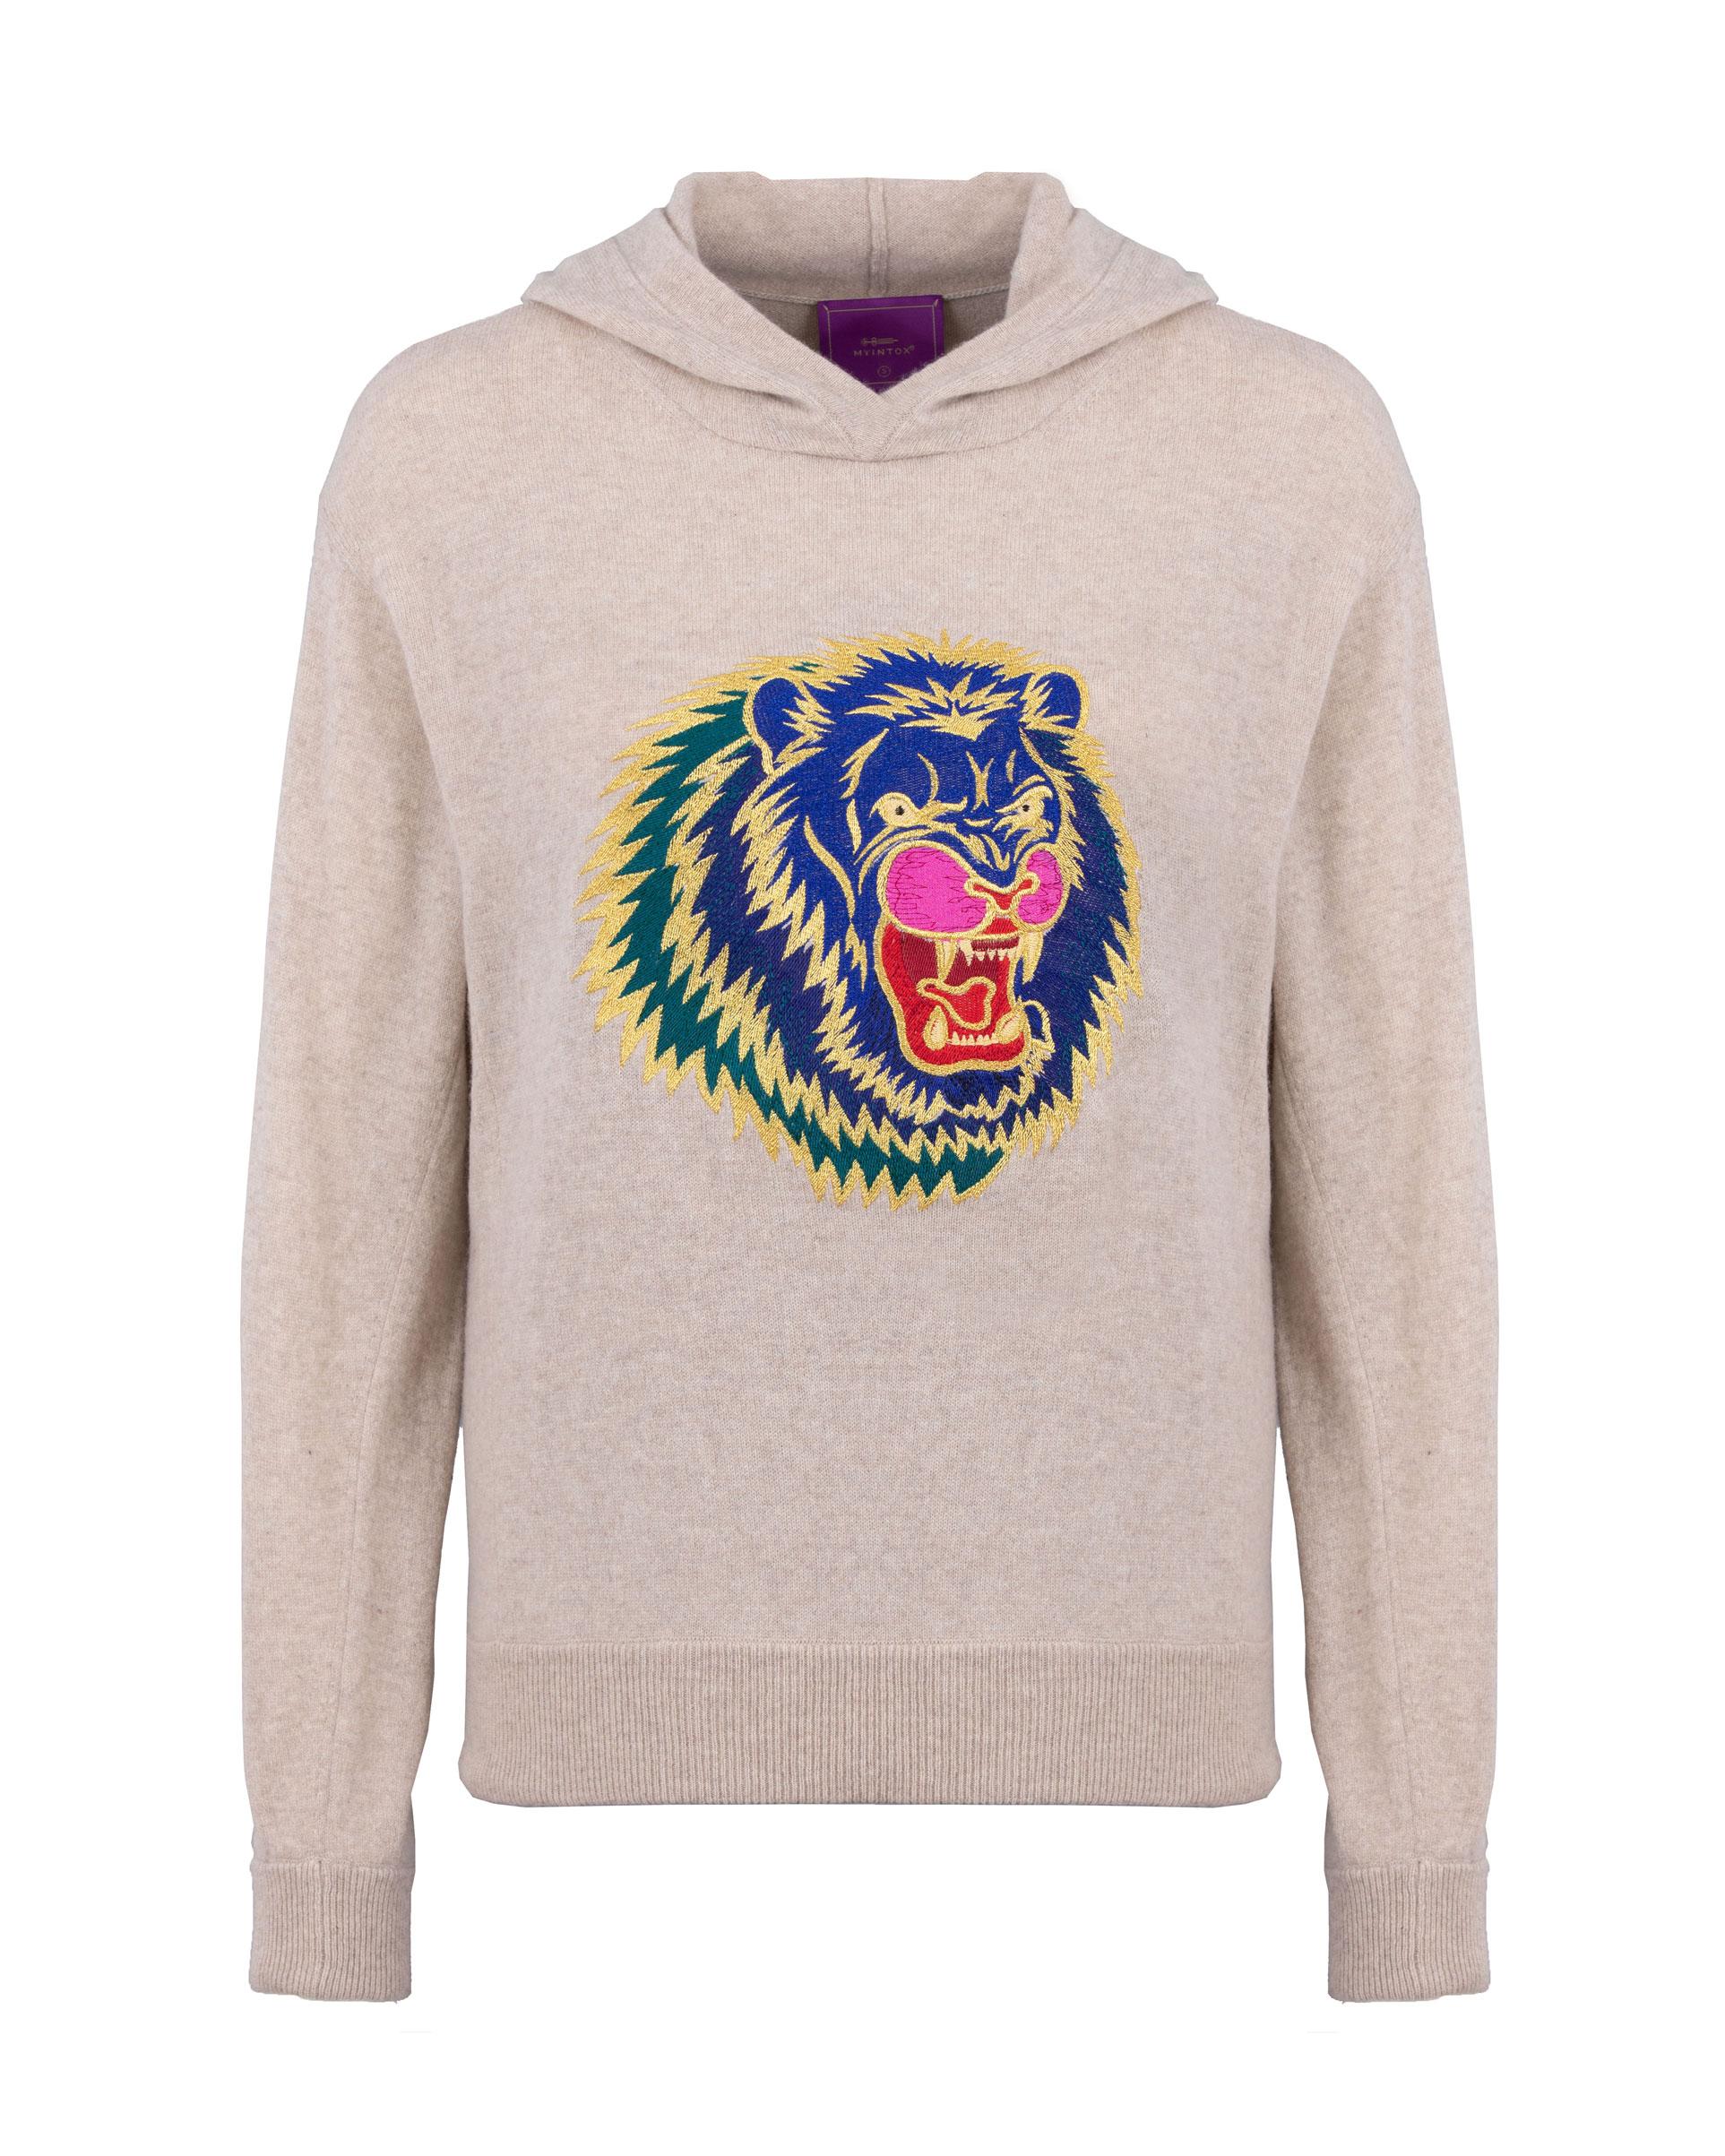 Crazy Lion Hoody - XS